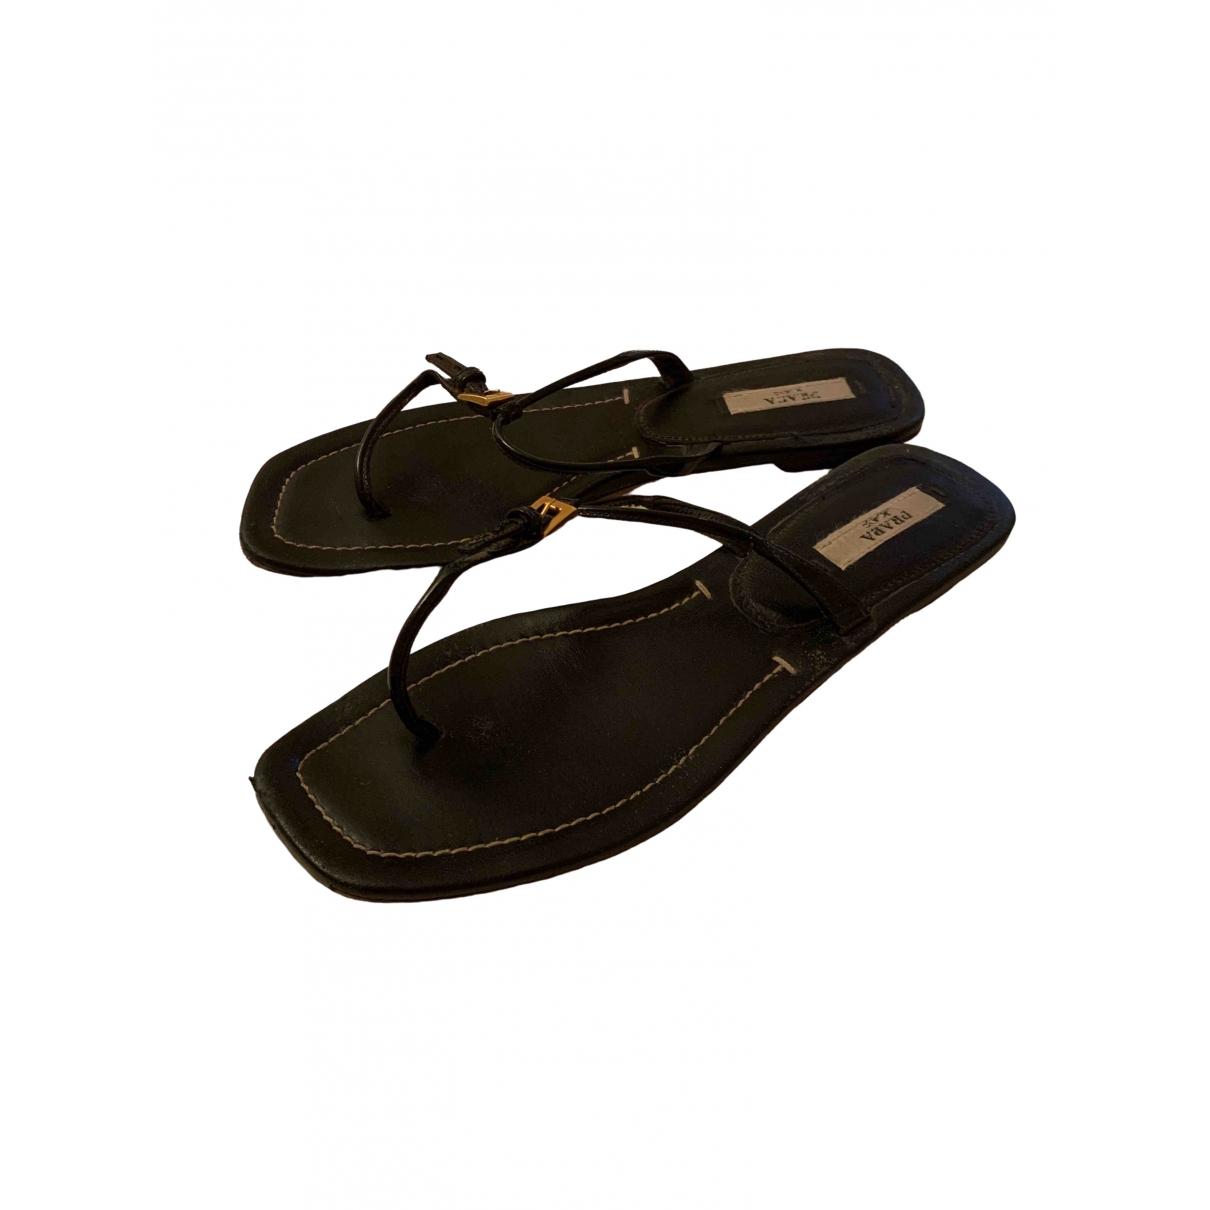 Prada \N Black Leather Sandals for Women 36.5 EU